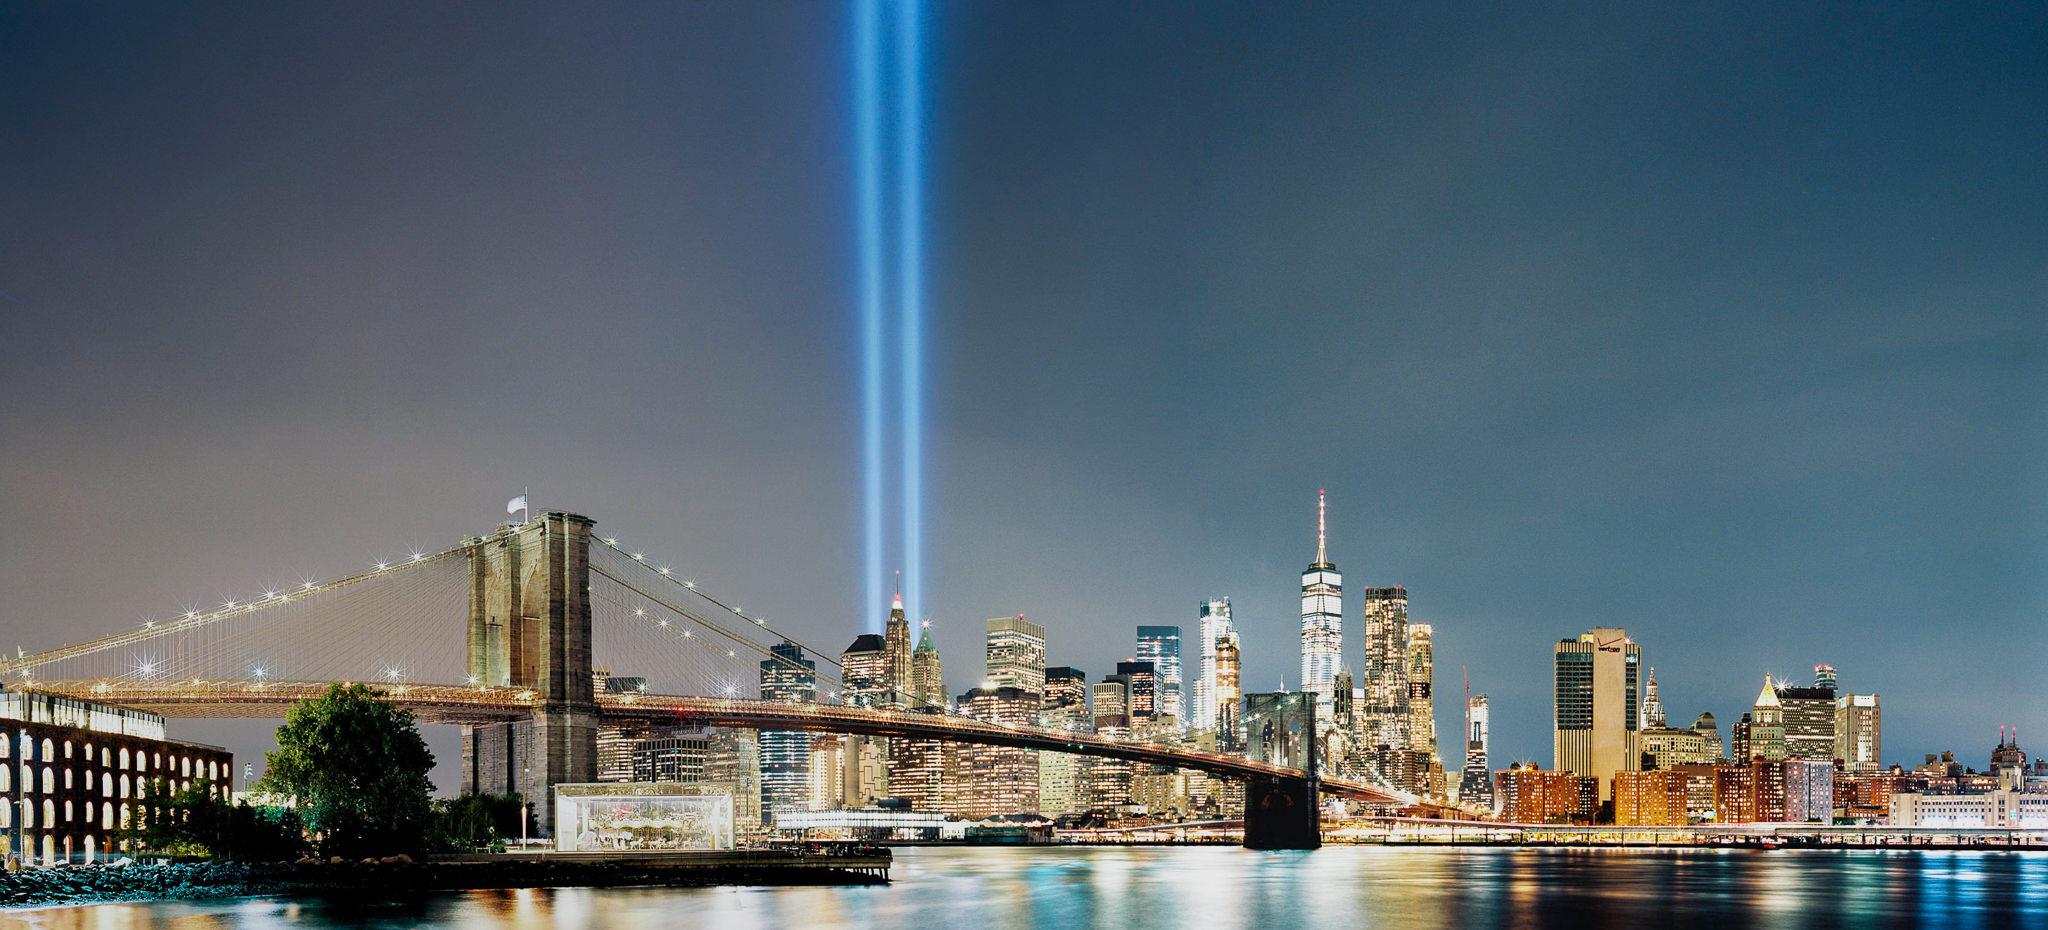 911 Light Tribute Pano Hasselblad 501cm Portra 400.JPG